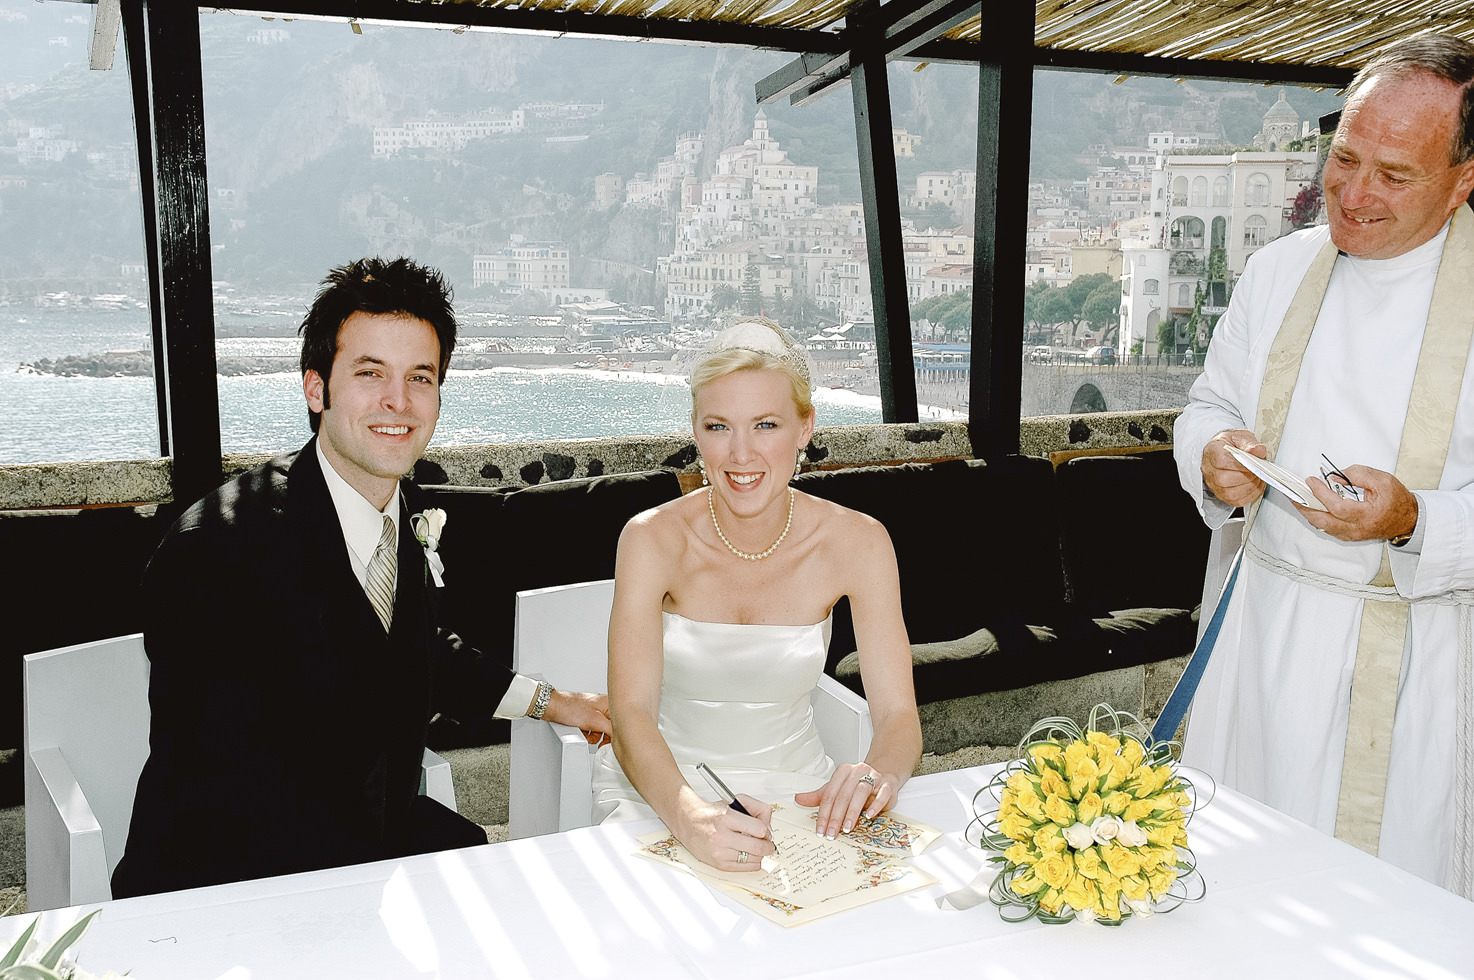 Protestant wedding ceremony in Amalfi